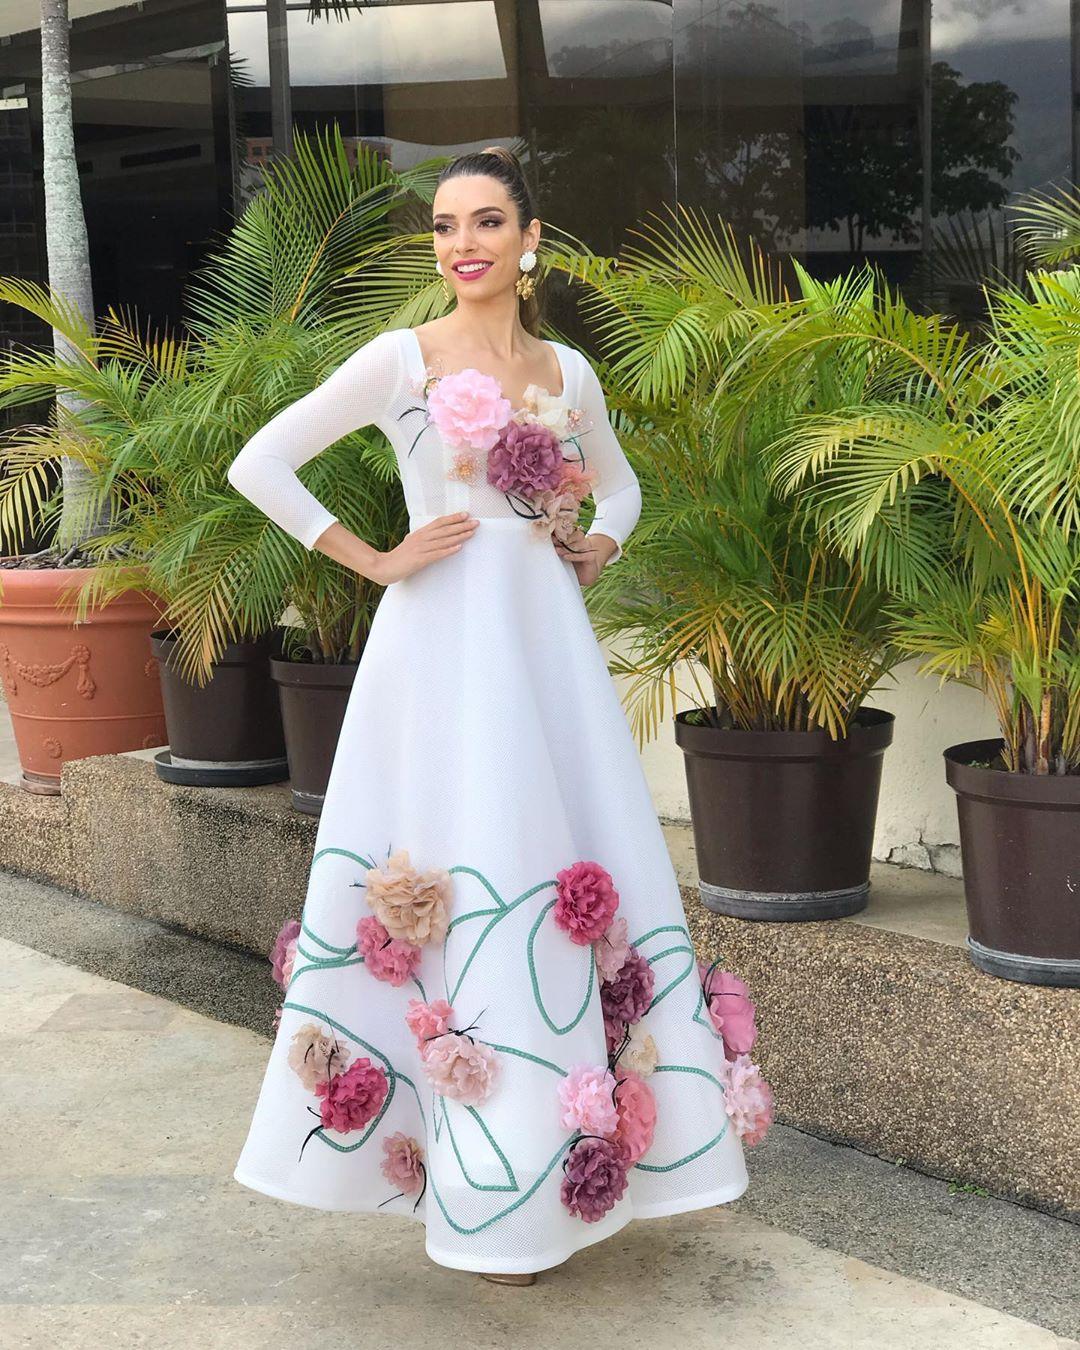 ainara de santamaria villamor, top 21 de miss grand international 2019/miss world cantabria 2018/miss earth spain 2017. - Página 17 75231110